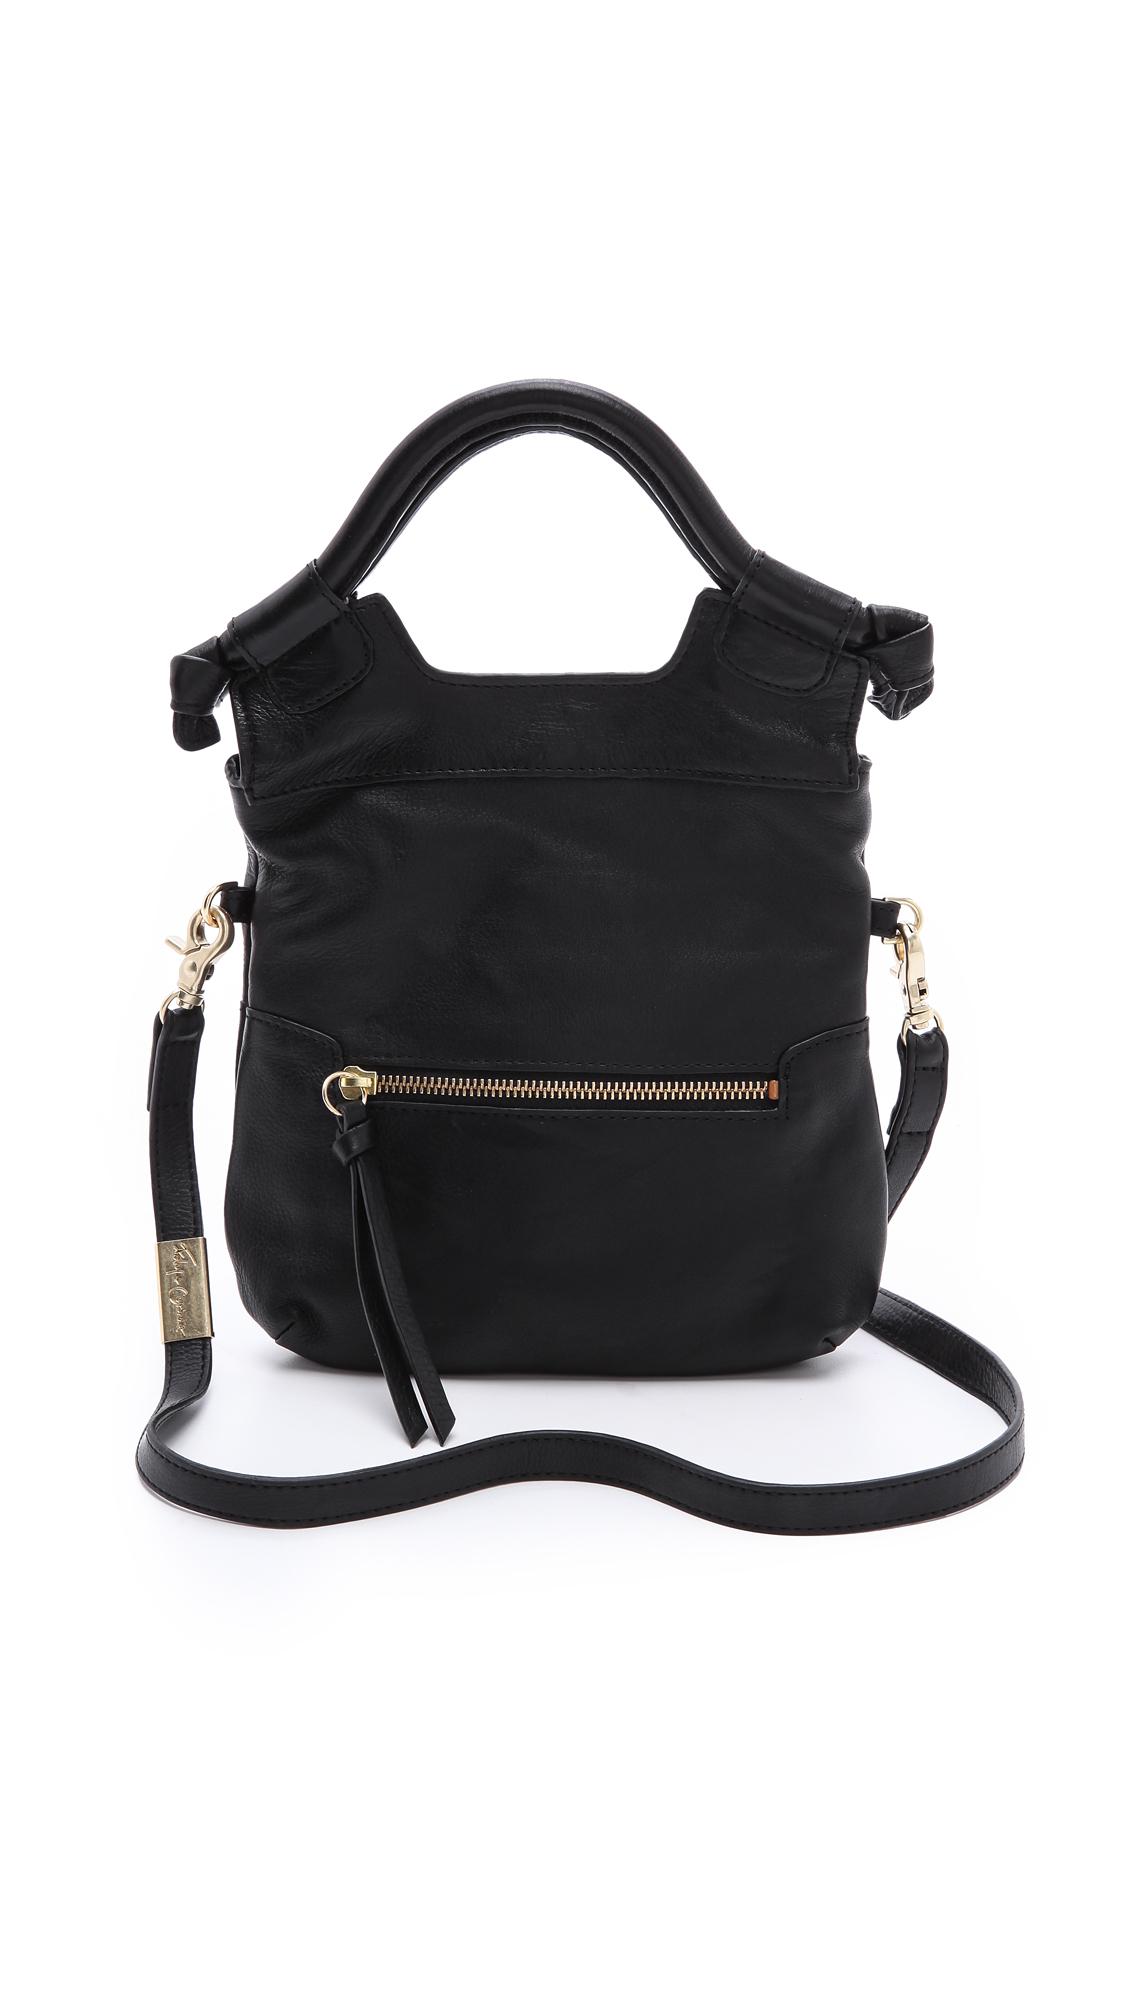 Lyst Foley Corinna Disco City Bag Black In Black